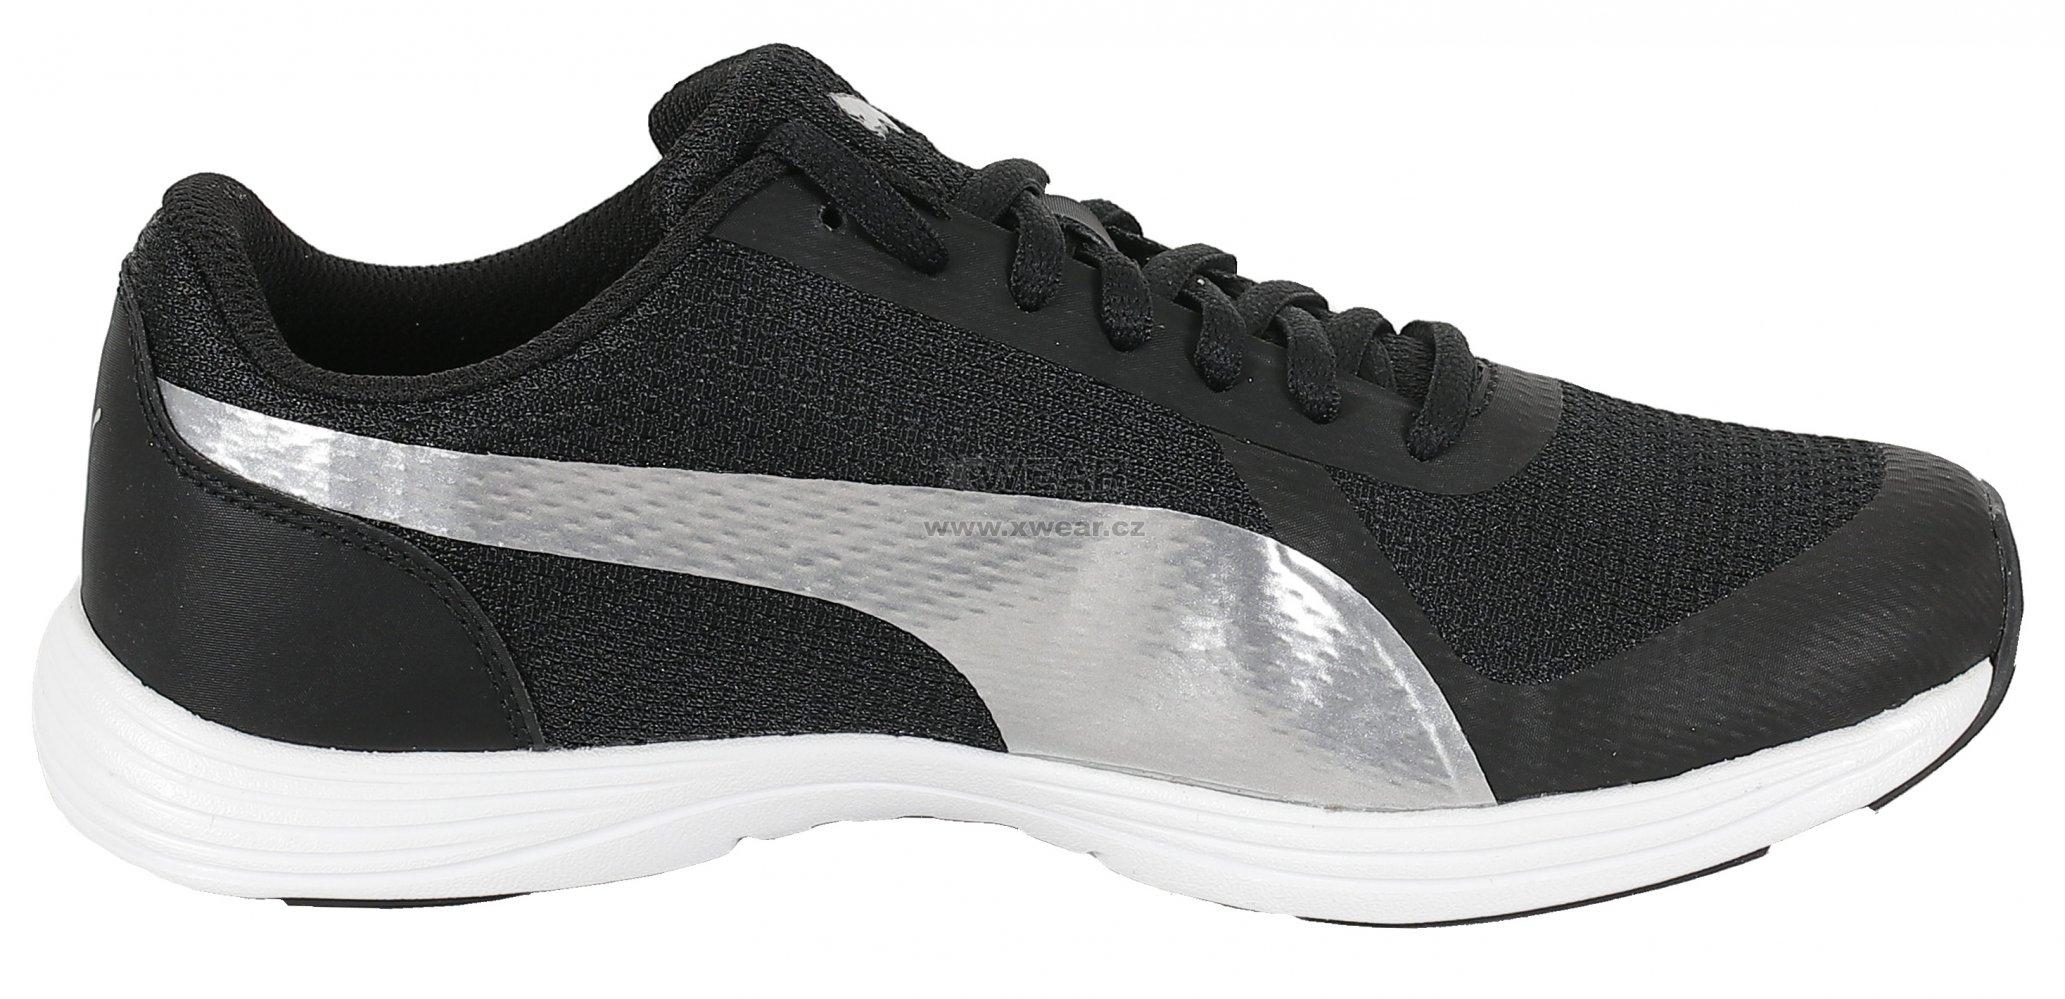 Dámská volnočasová obuv PUMA MODERN S 36089903 ČERNOBÍLÁ velikost ... 0d0cee8c827